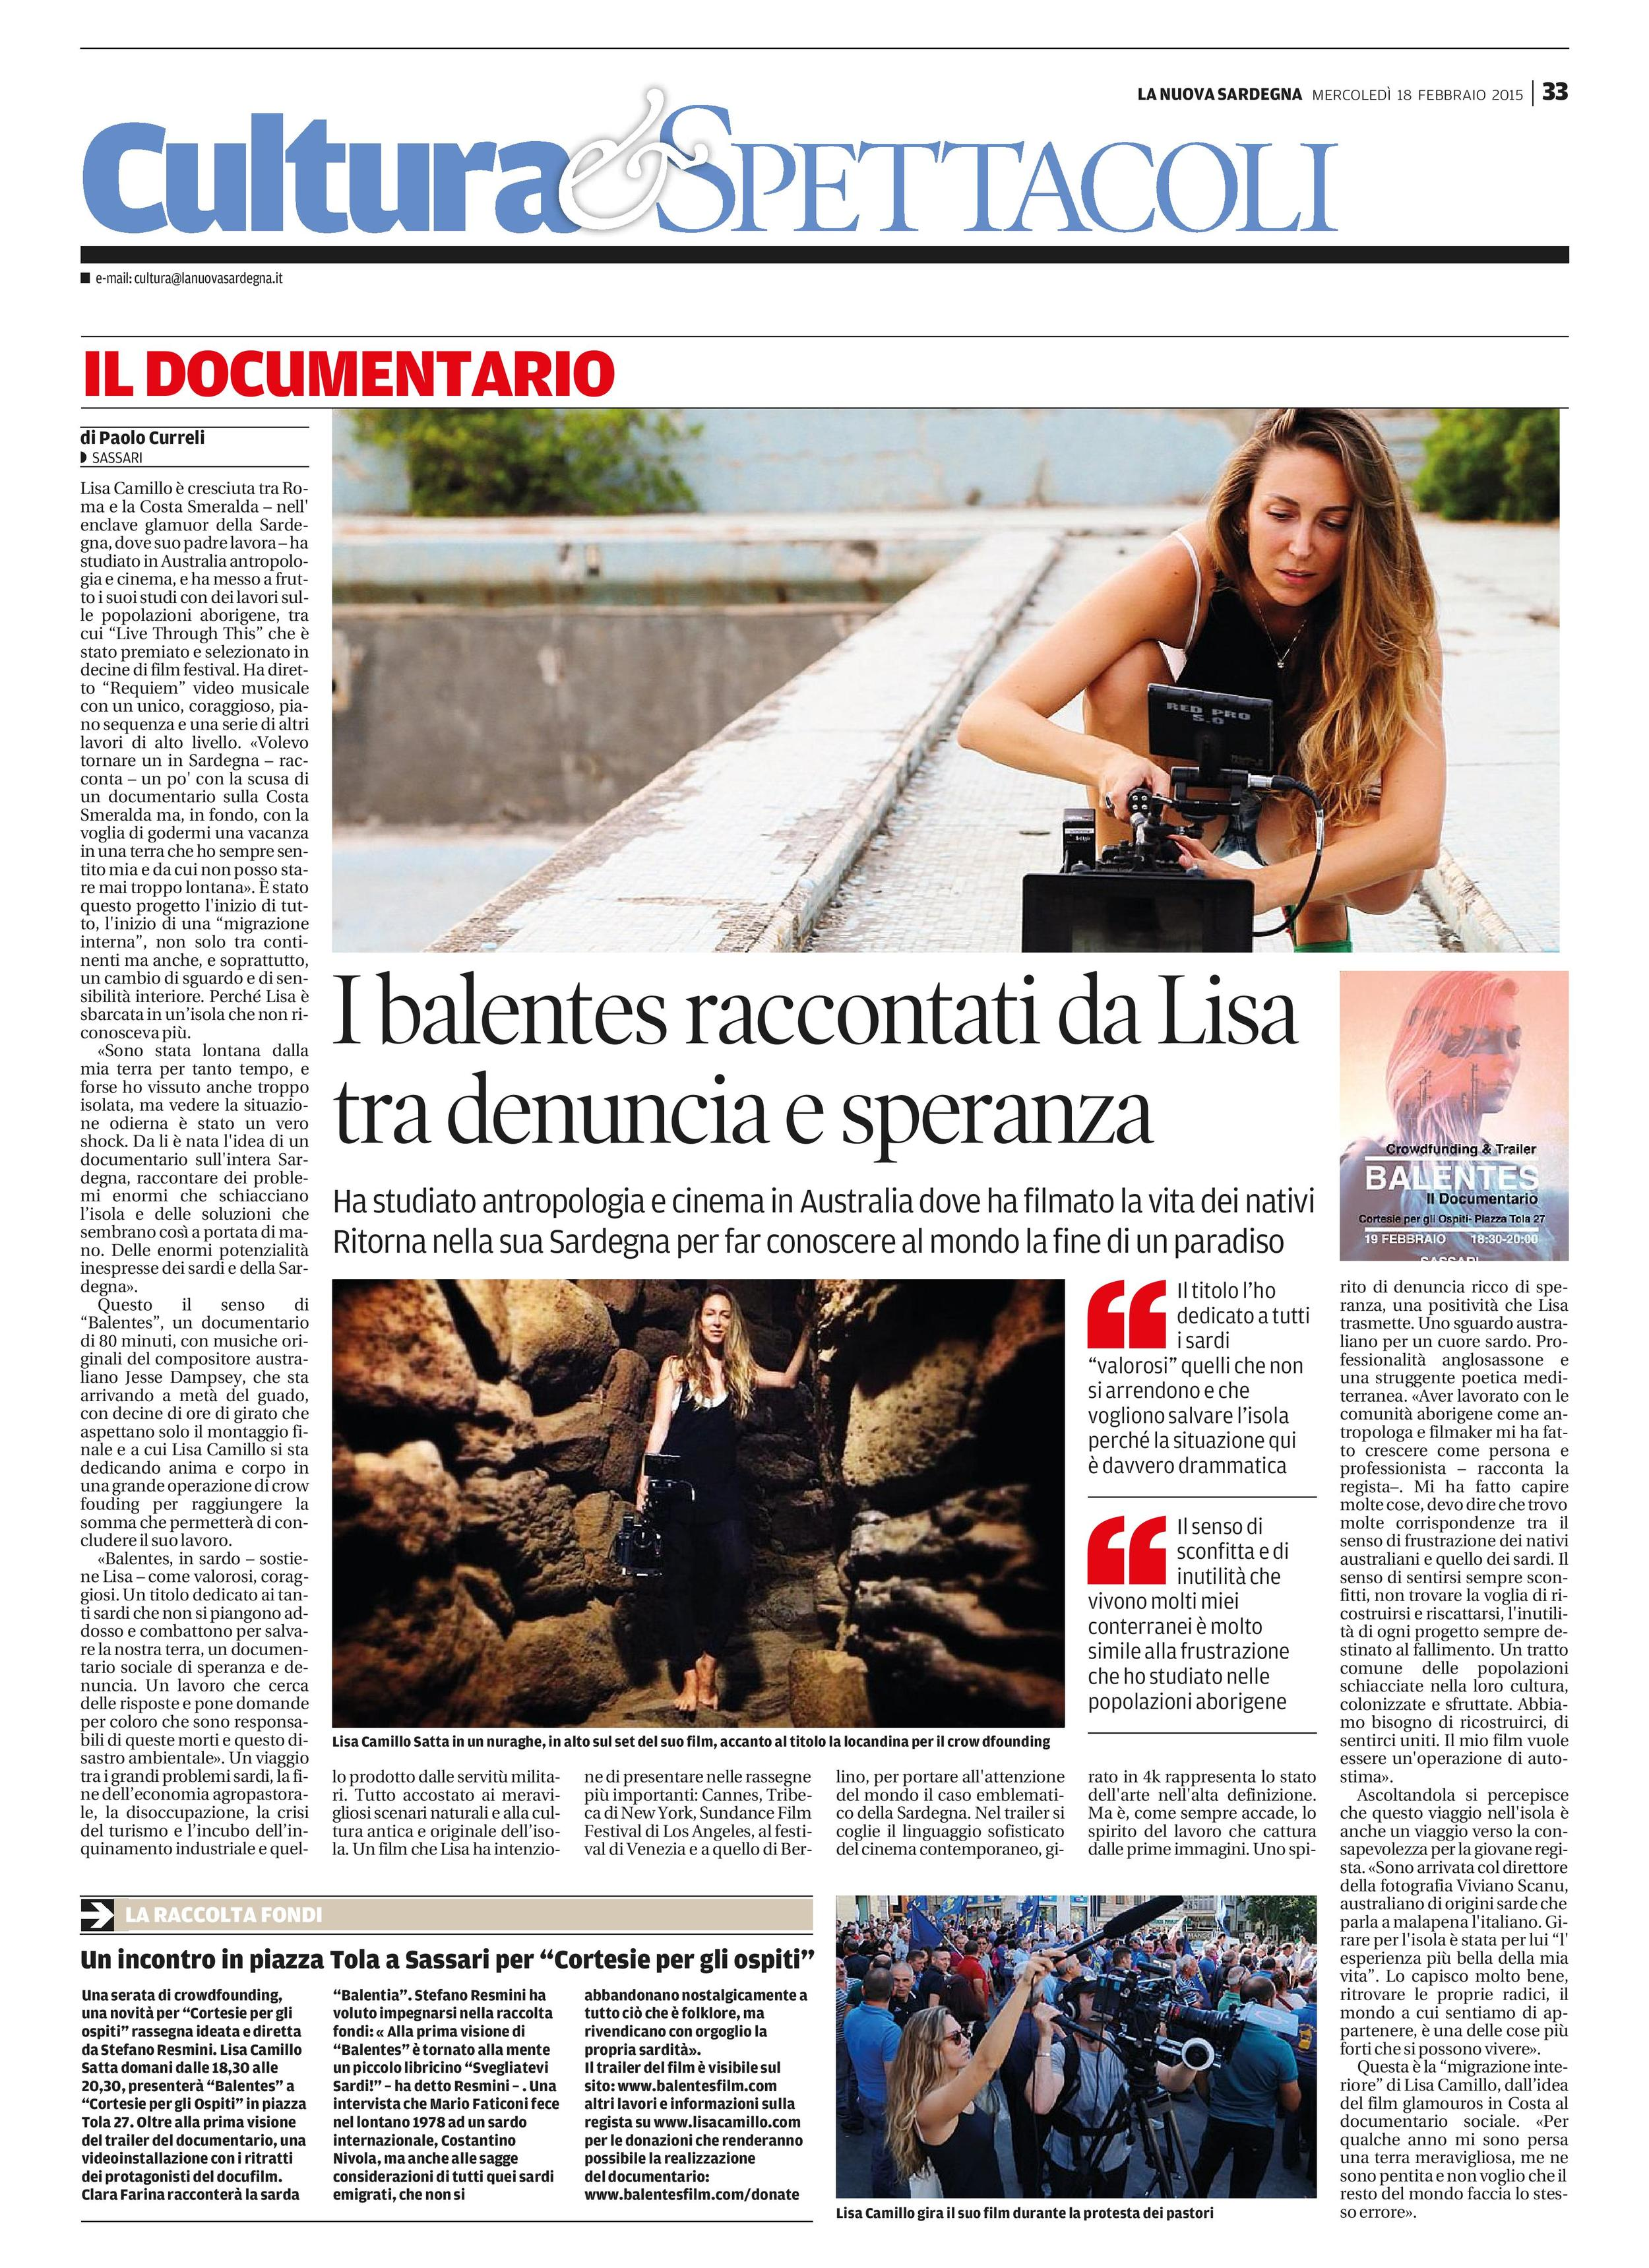 La Nuova Sardegna-page-001.jpg